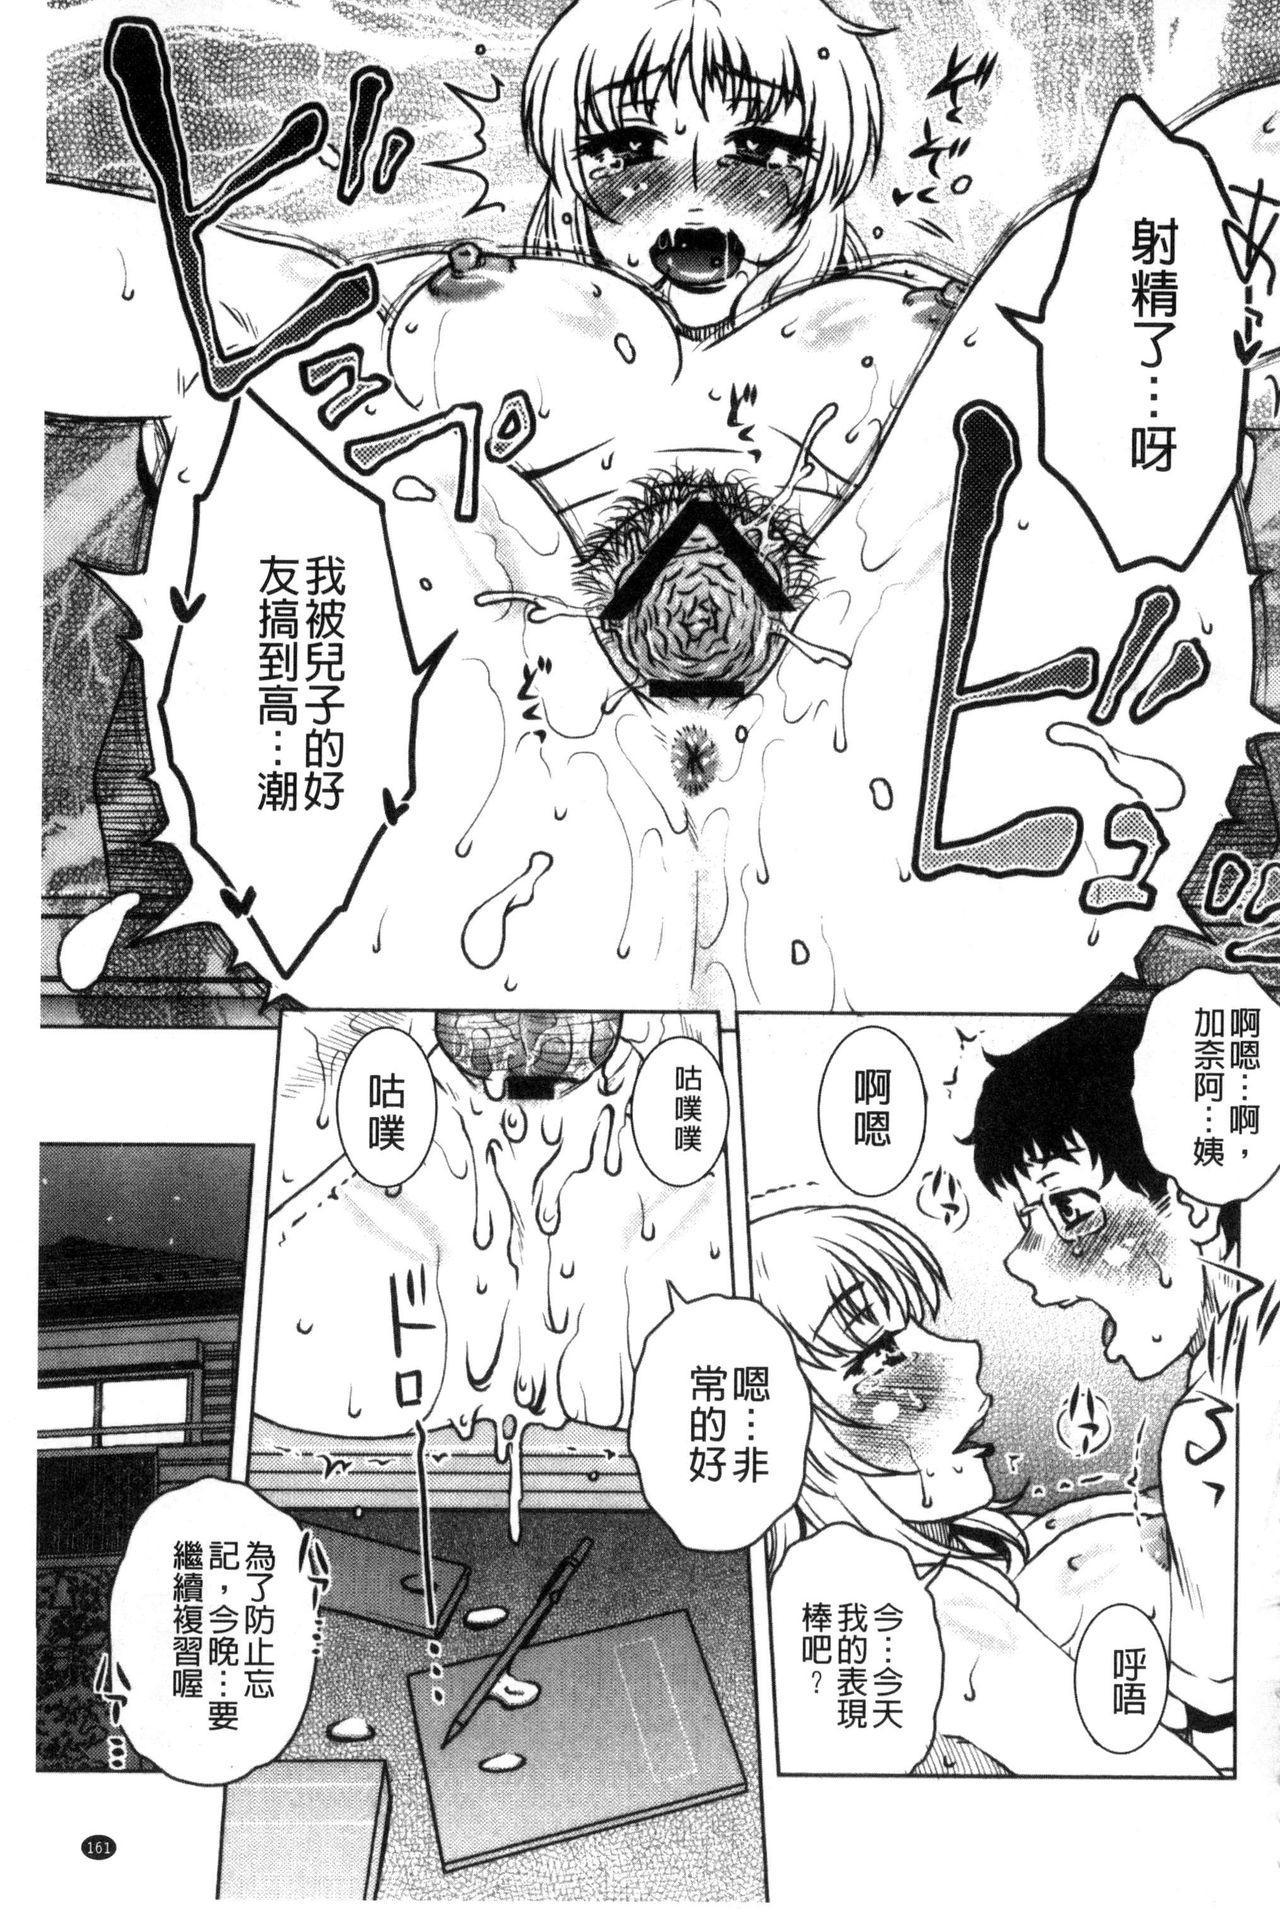 [Kurumiya Mashimin] Uchi no Shachou no Hamedere Inkatsu - Our President is HAME-DERE in Licentious sex life. [Chinese] 165